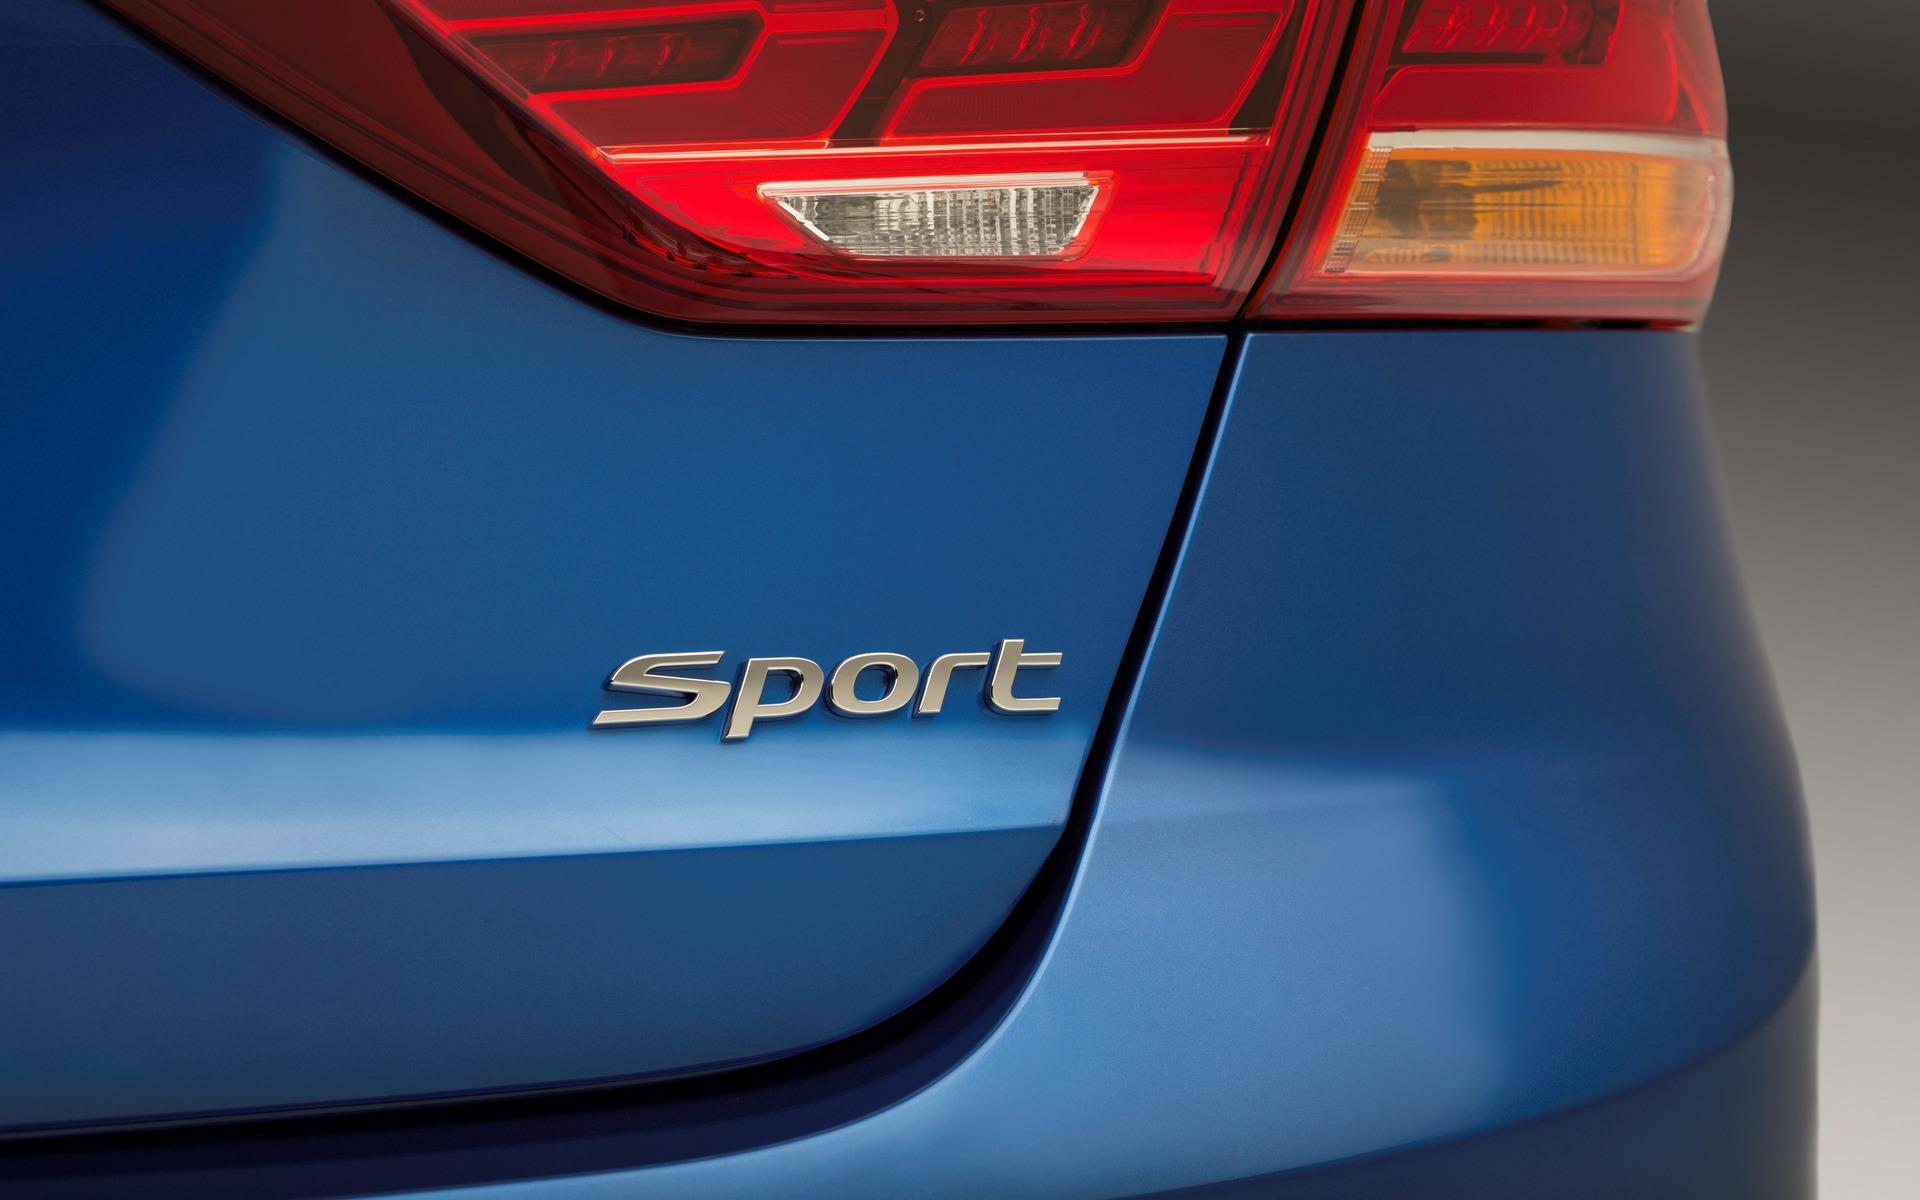 Pictures Of A Hyundai Elantra Autos Post